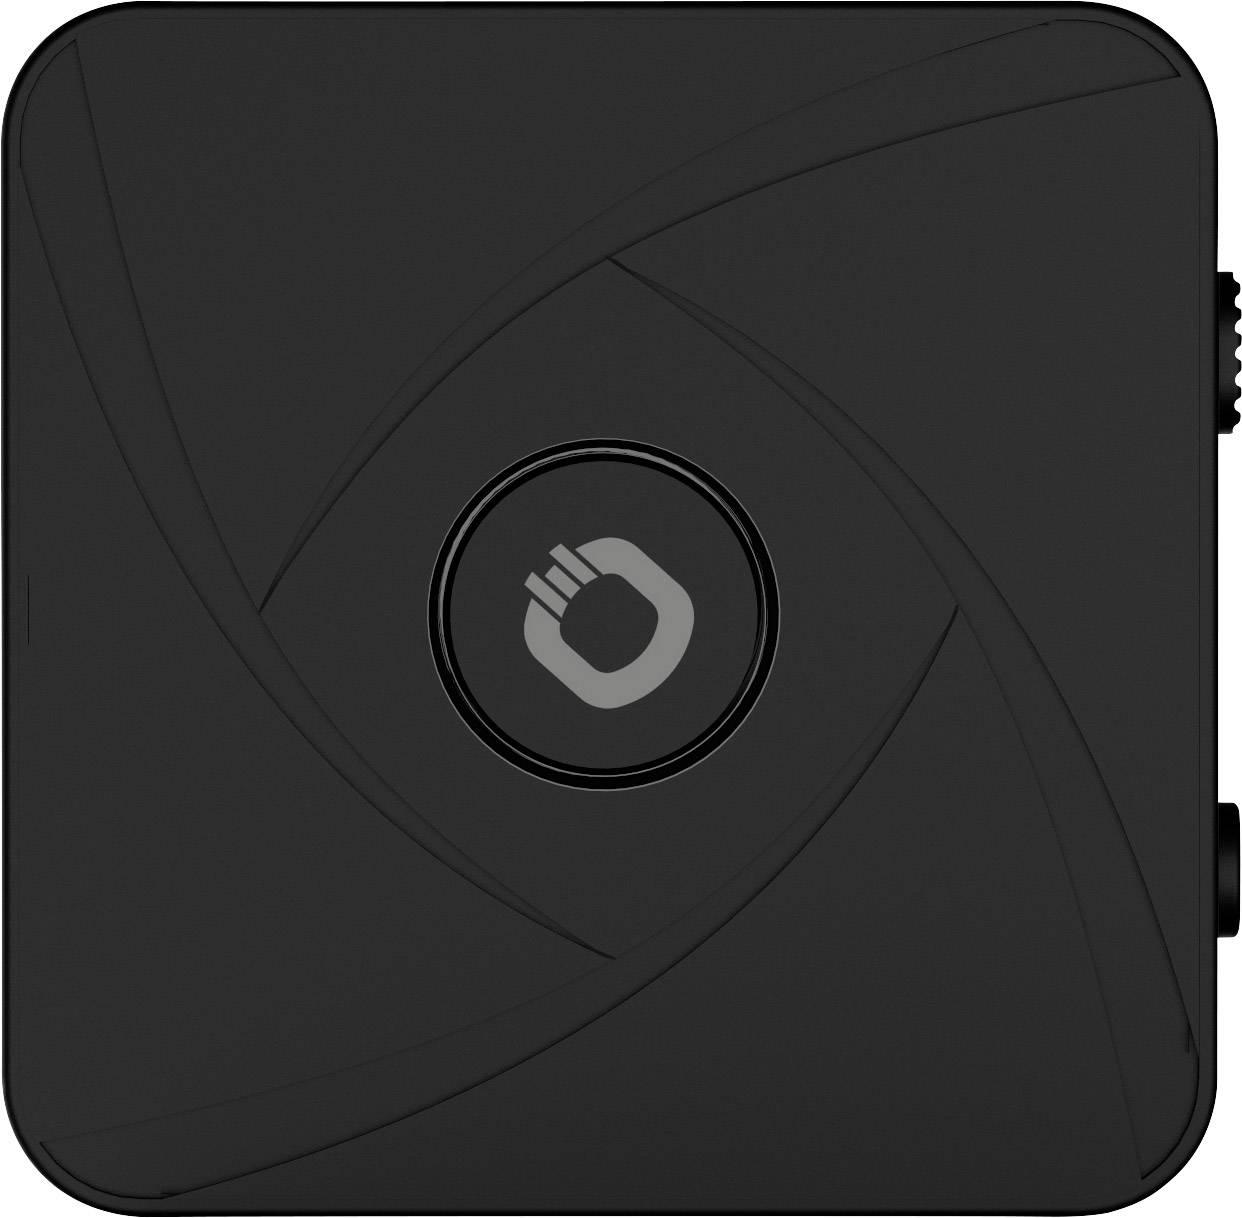 <br>  Oehlbach<br>  BTR Xtreme 5.0<br>  Bluetooth® sprejemnik glasbe<br>  Bluetooth: 5.0<br>  Domet (maks. na prostem)=1